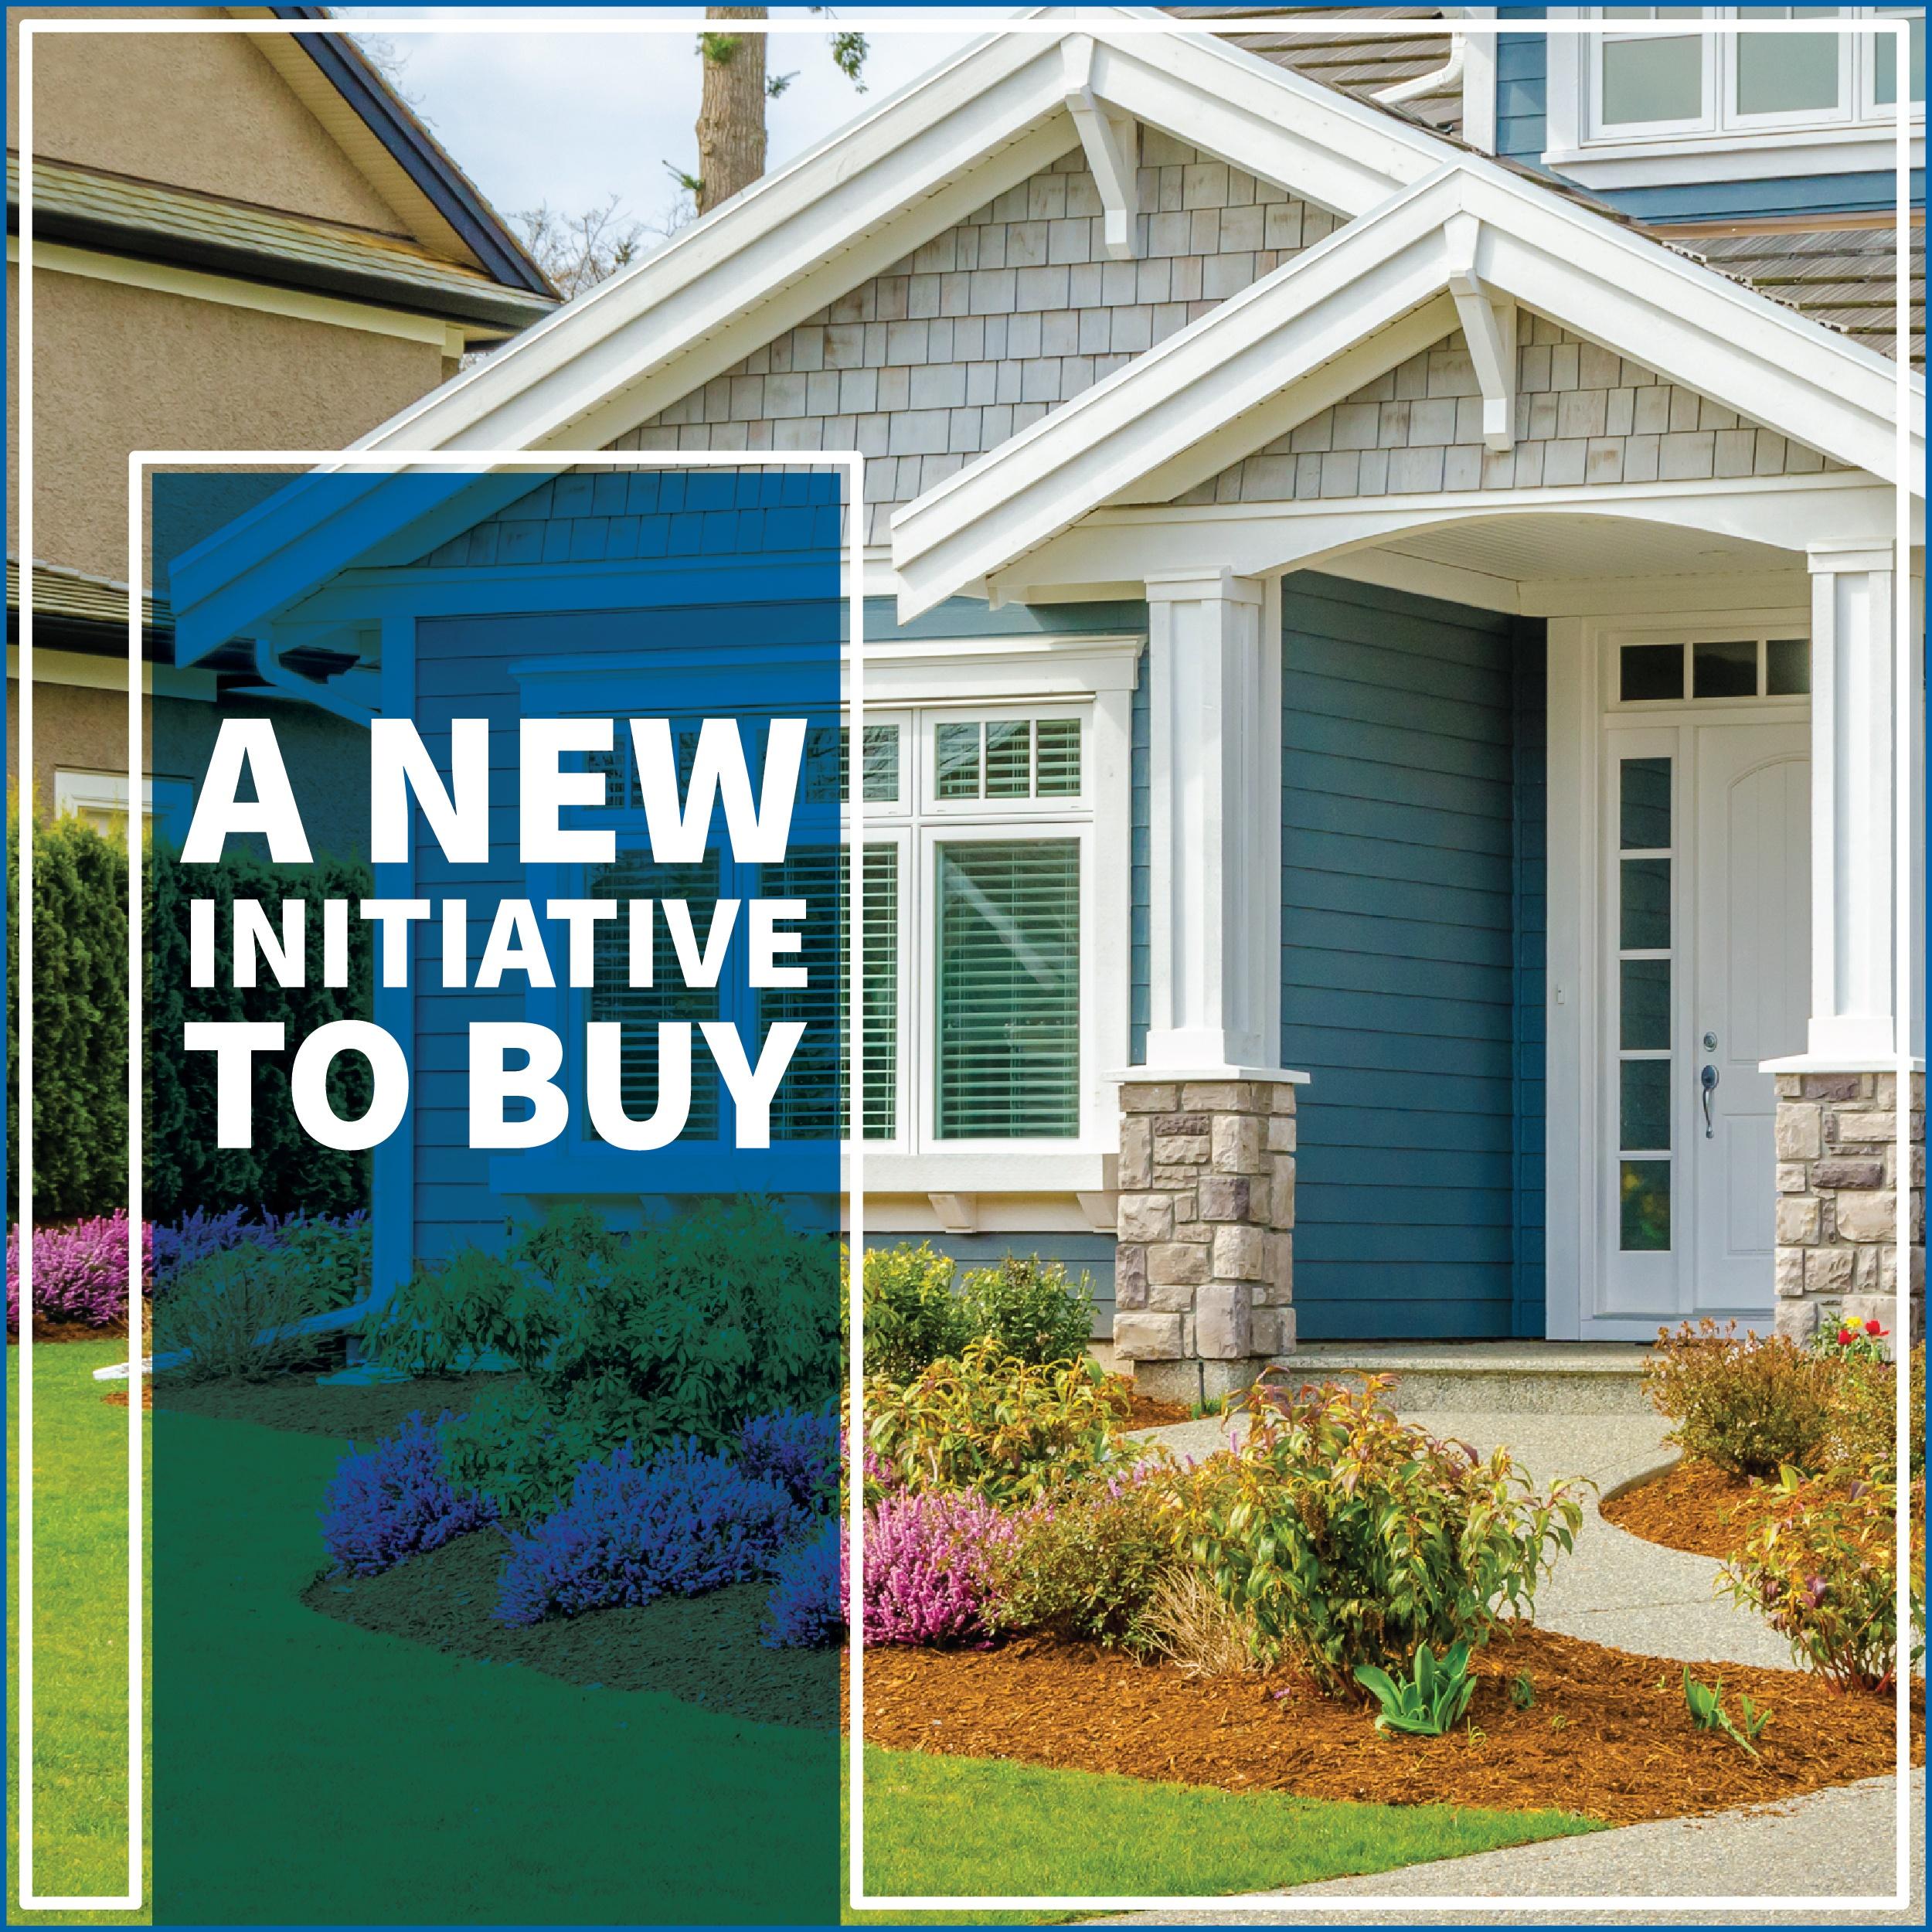 New_initiative_to_buy-01